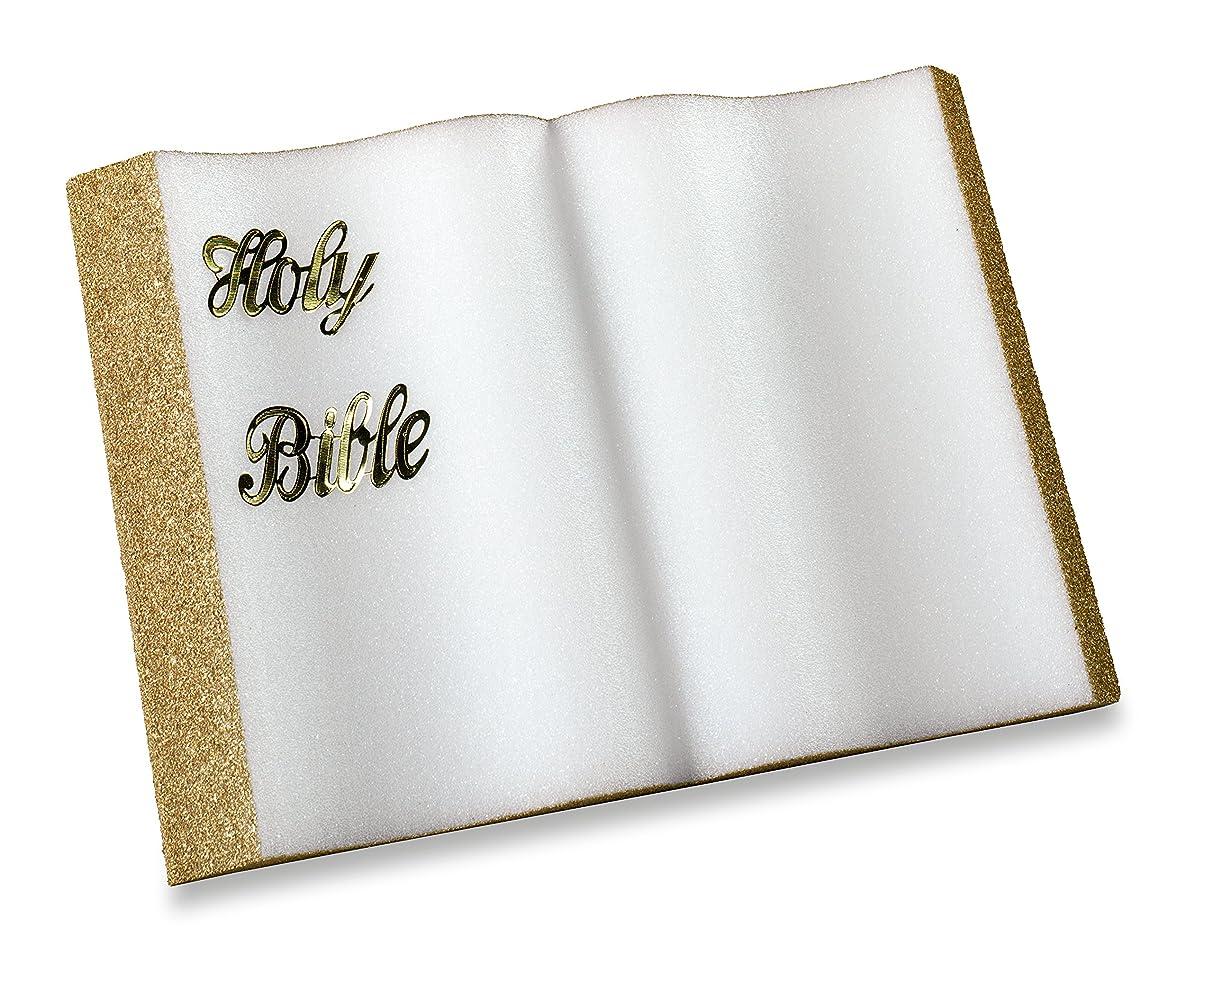 FloraCraft Styrofoam Bible 1.5 Inch x 7.75 Inch x 12 Inch Gold